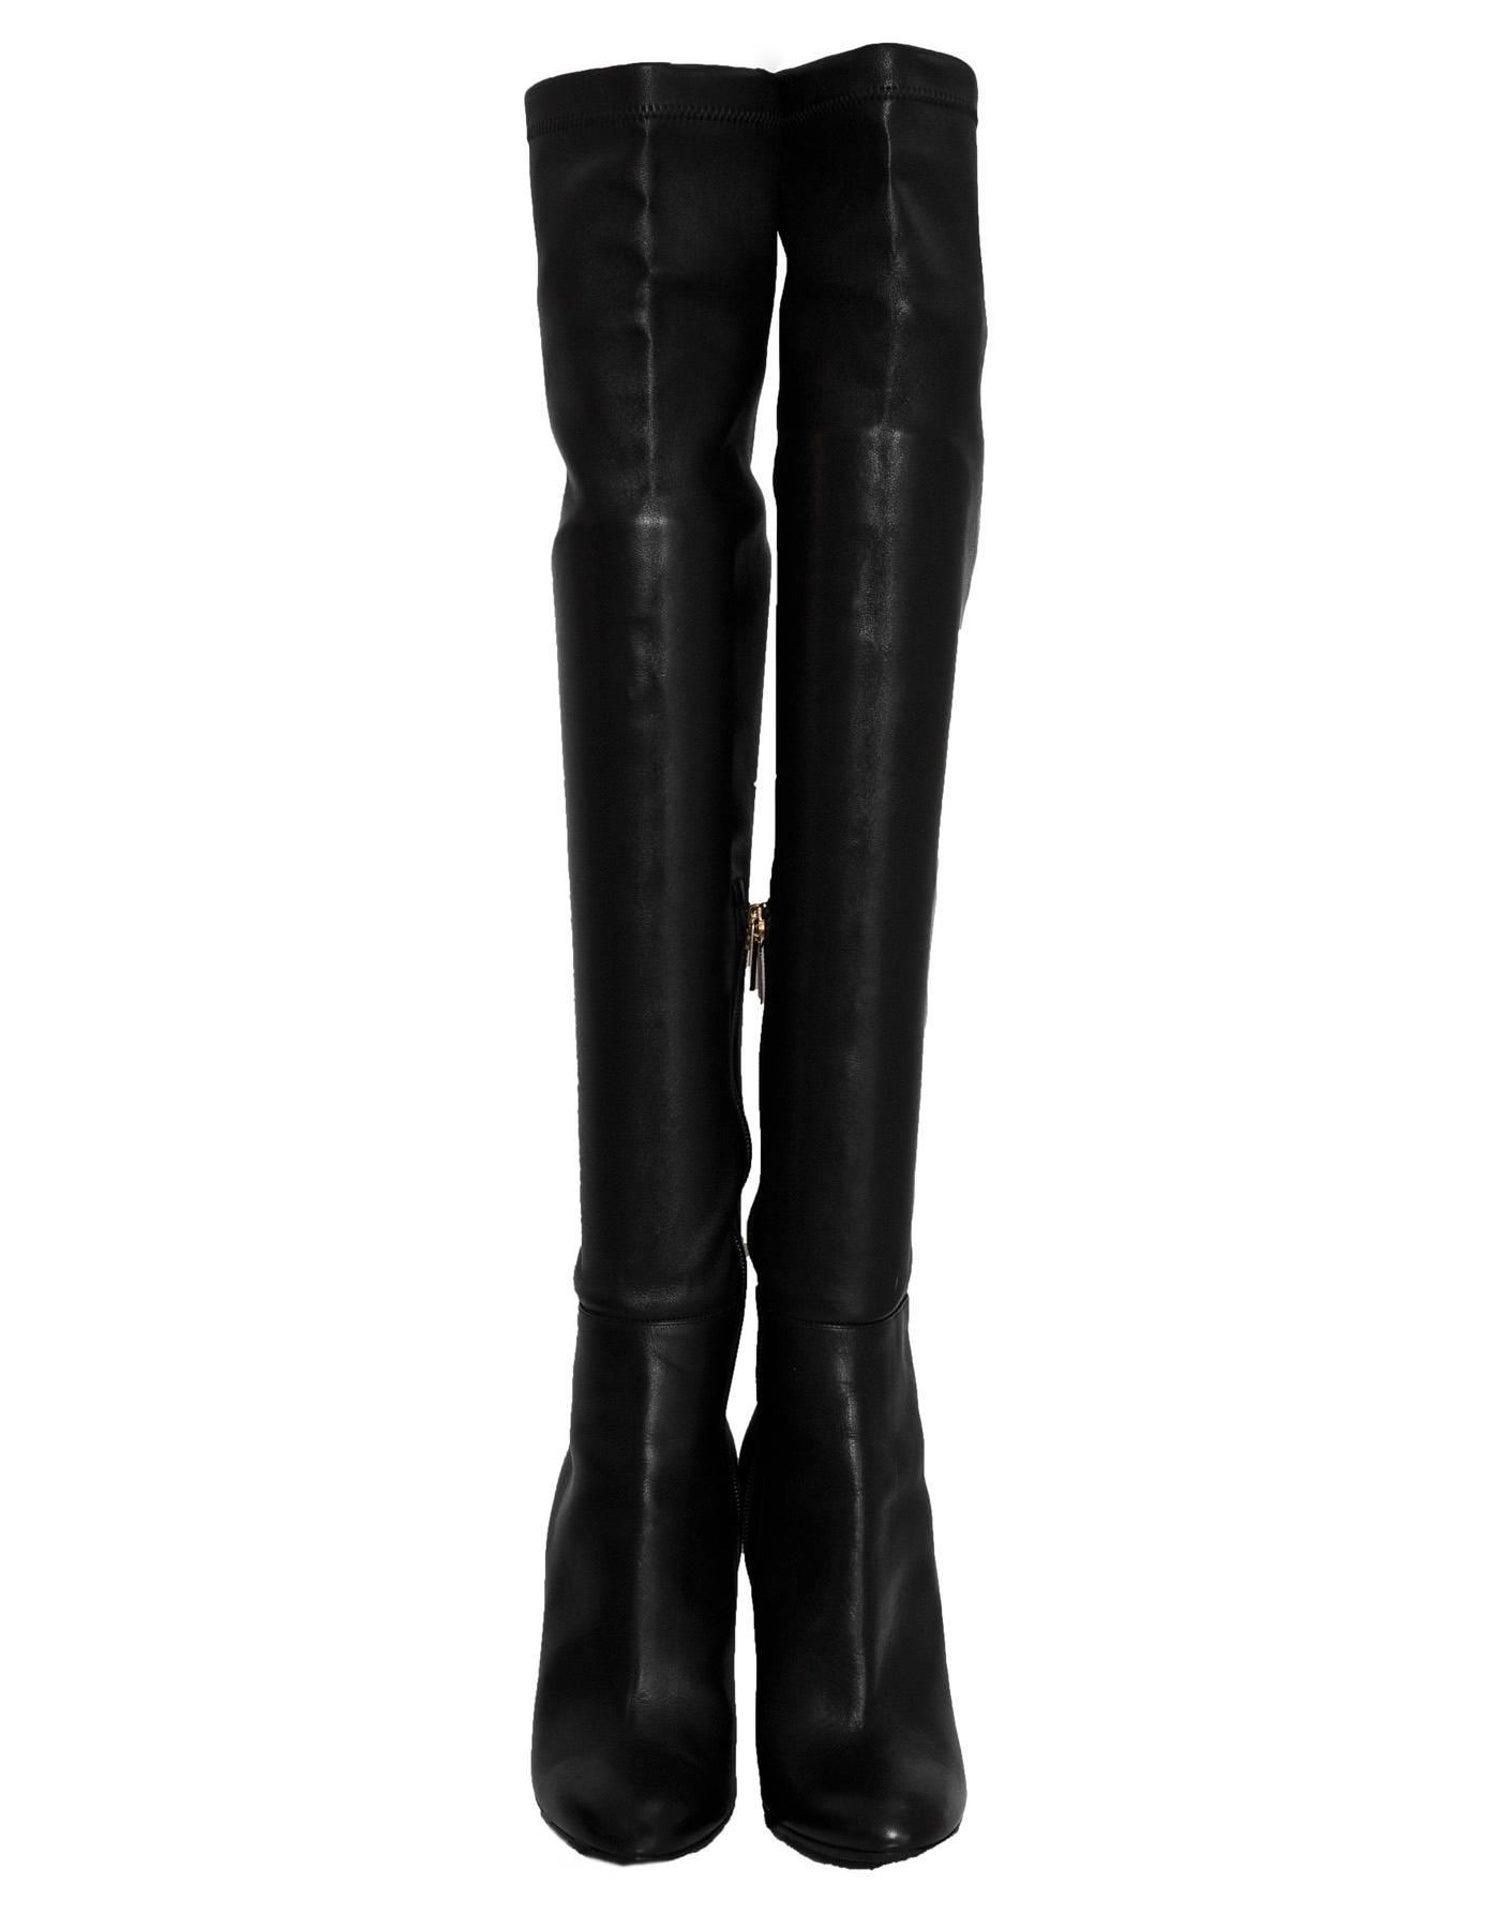 d9729c53e1f Jimmy Choo Black Calf Leather Turner Over-The-Knee Boots Sz 36